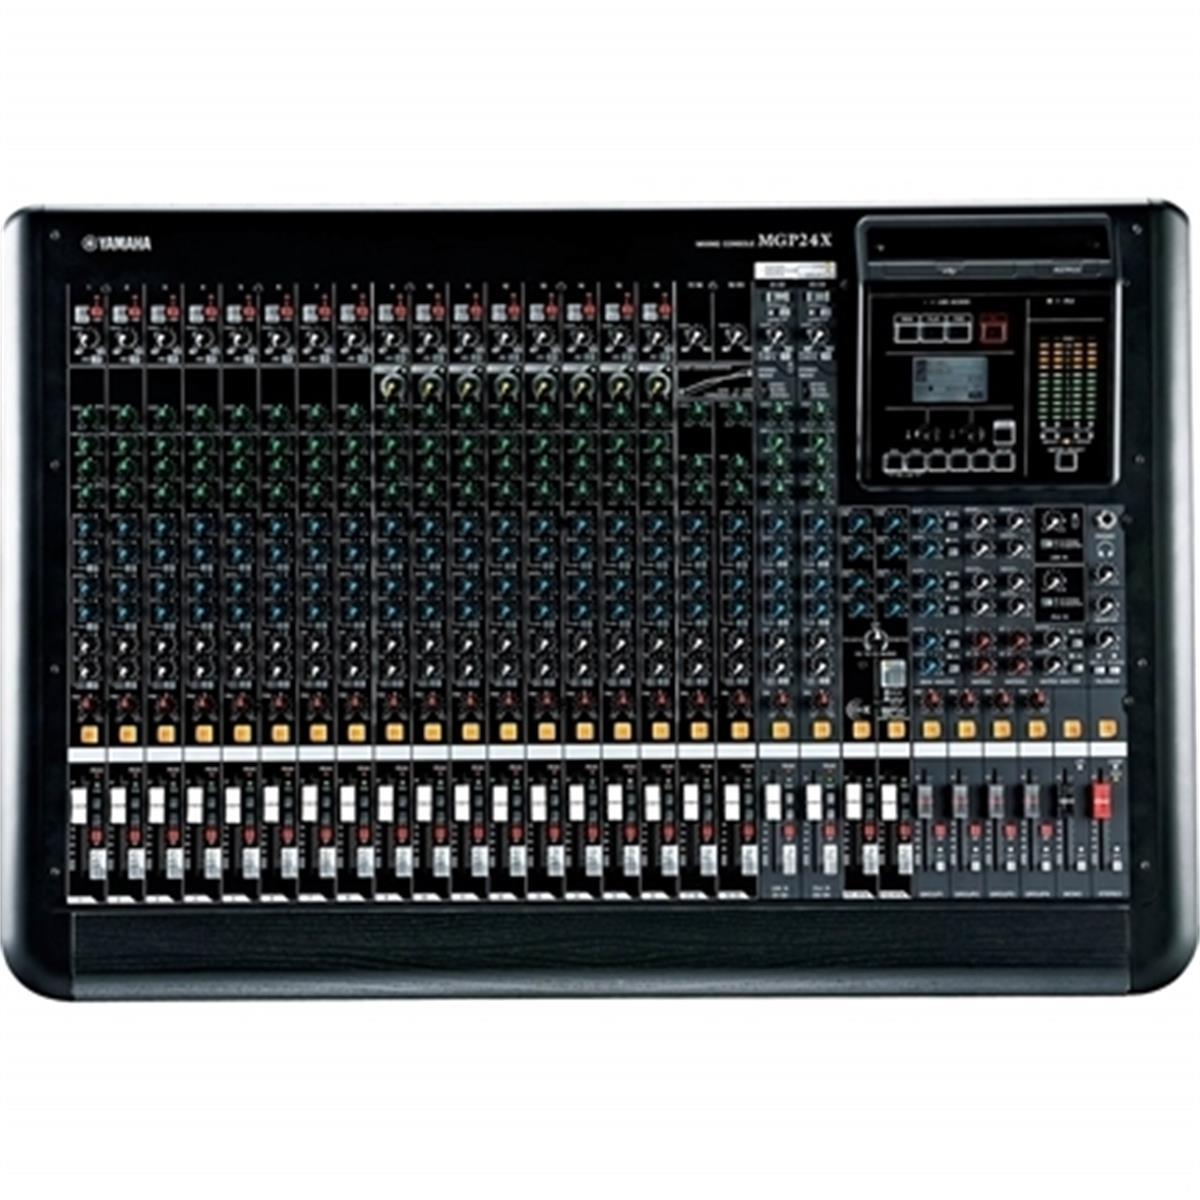 Mesa De Som Analógica 16 Entradas Microfone 16 Mgp24x Yamaha